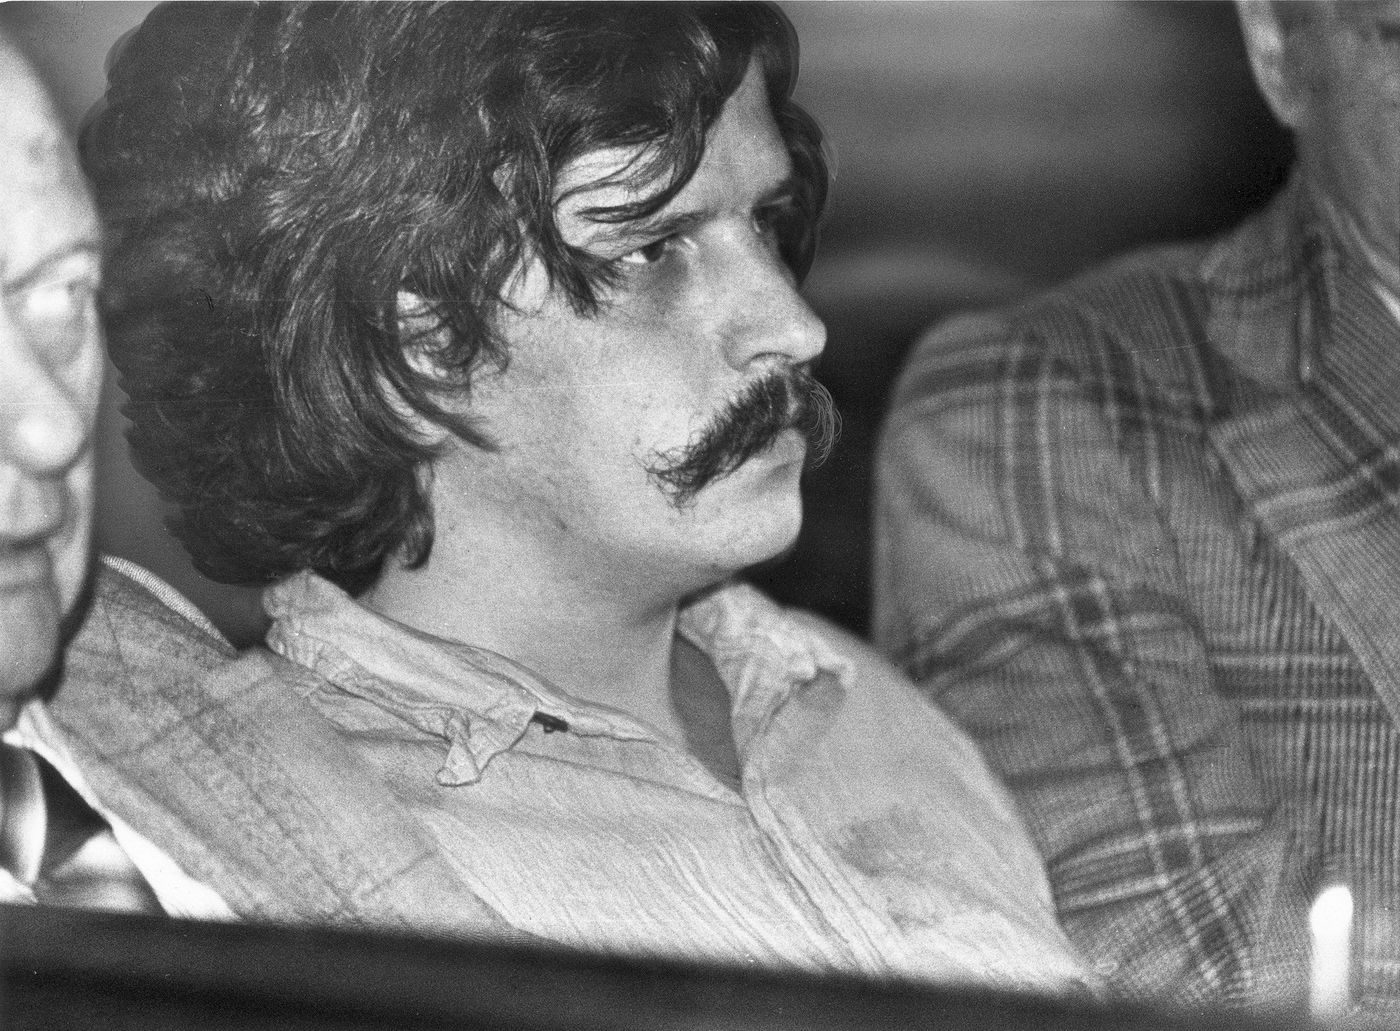 Huyền Thoại Sát Nhân Xa Lộ William Bonin (hay Freeway Killer)